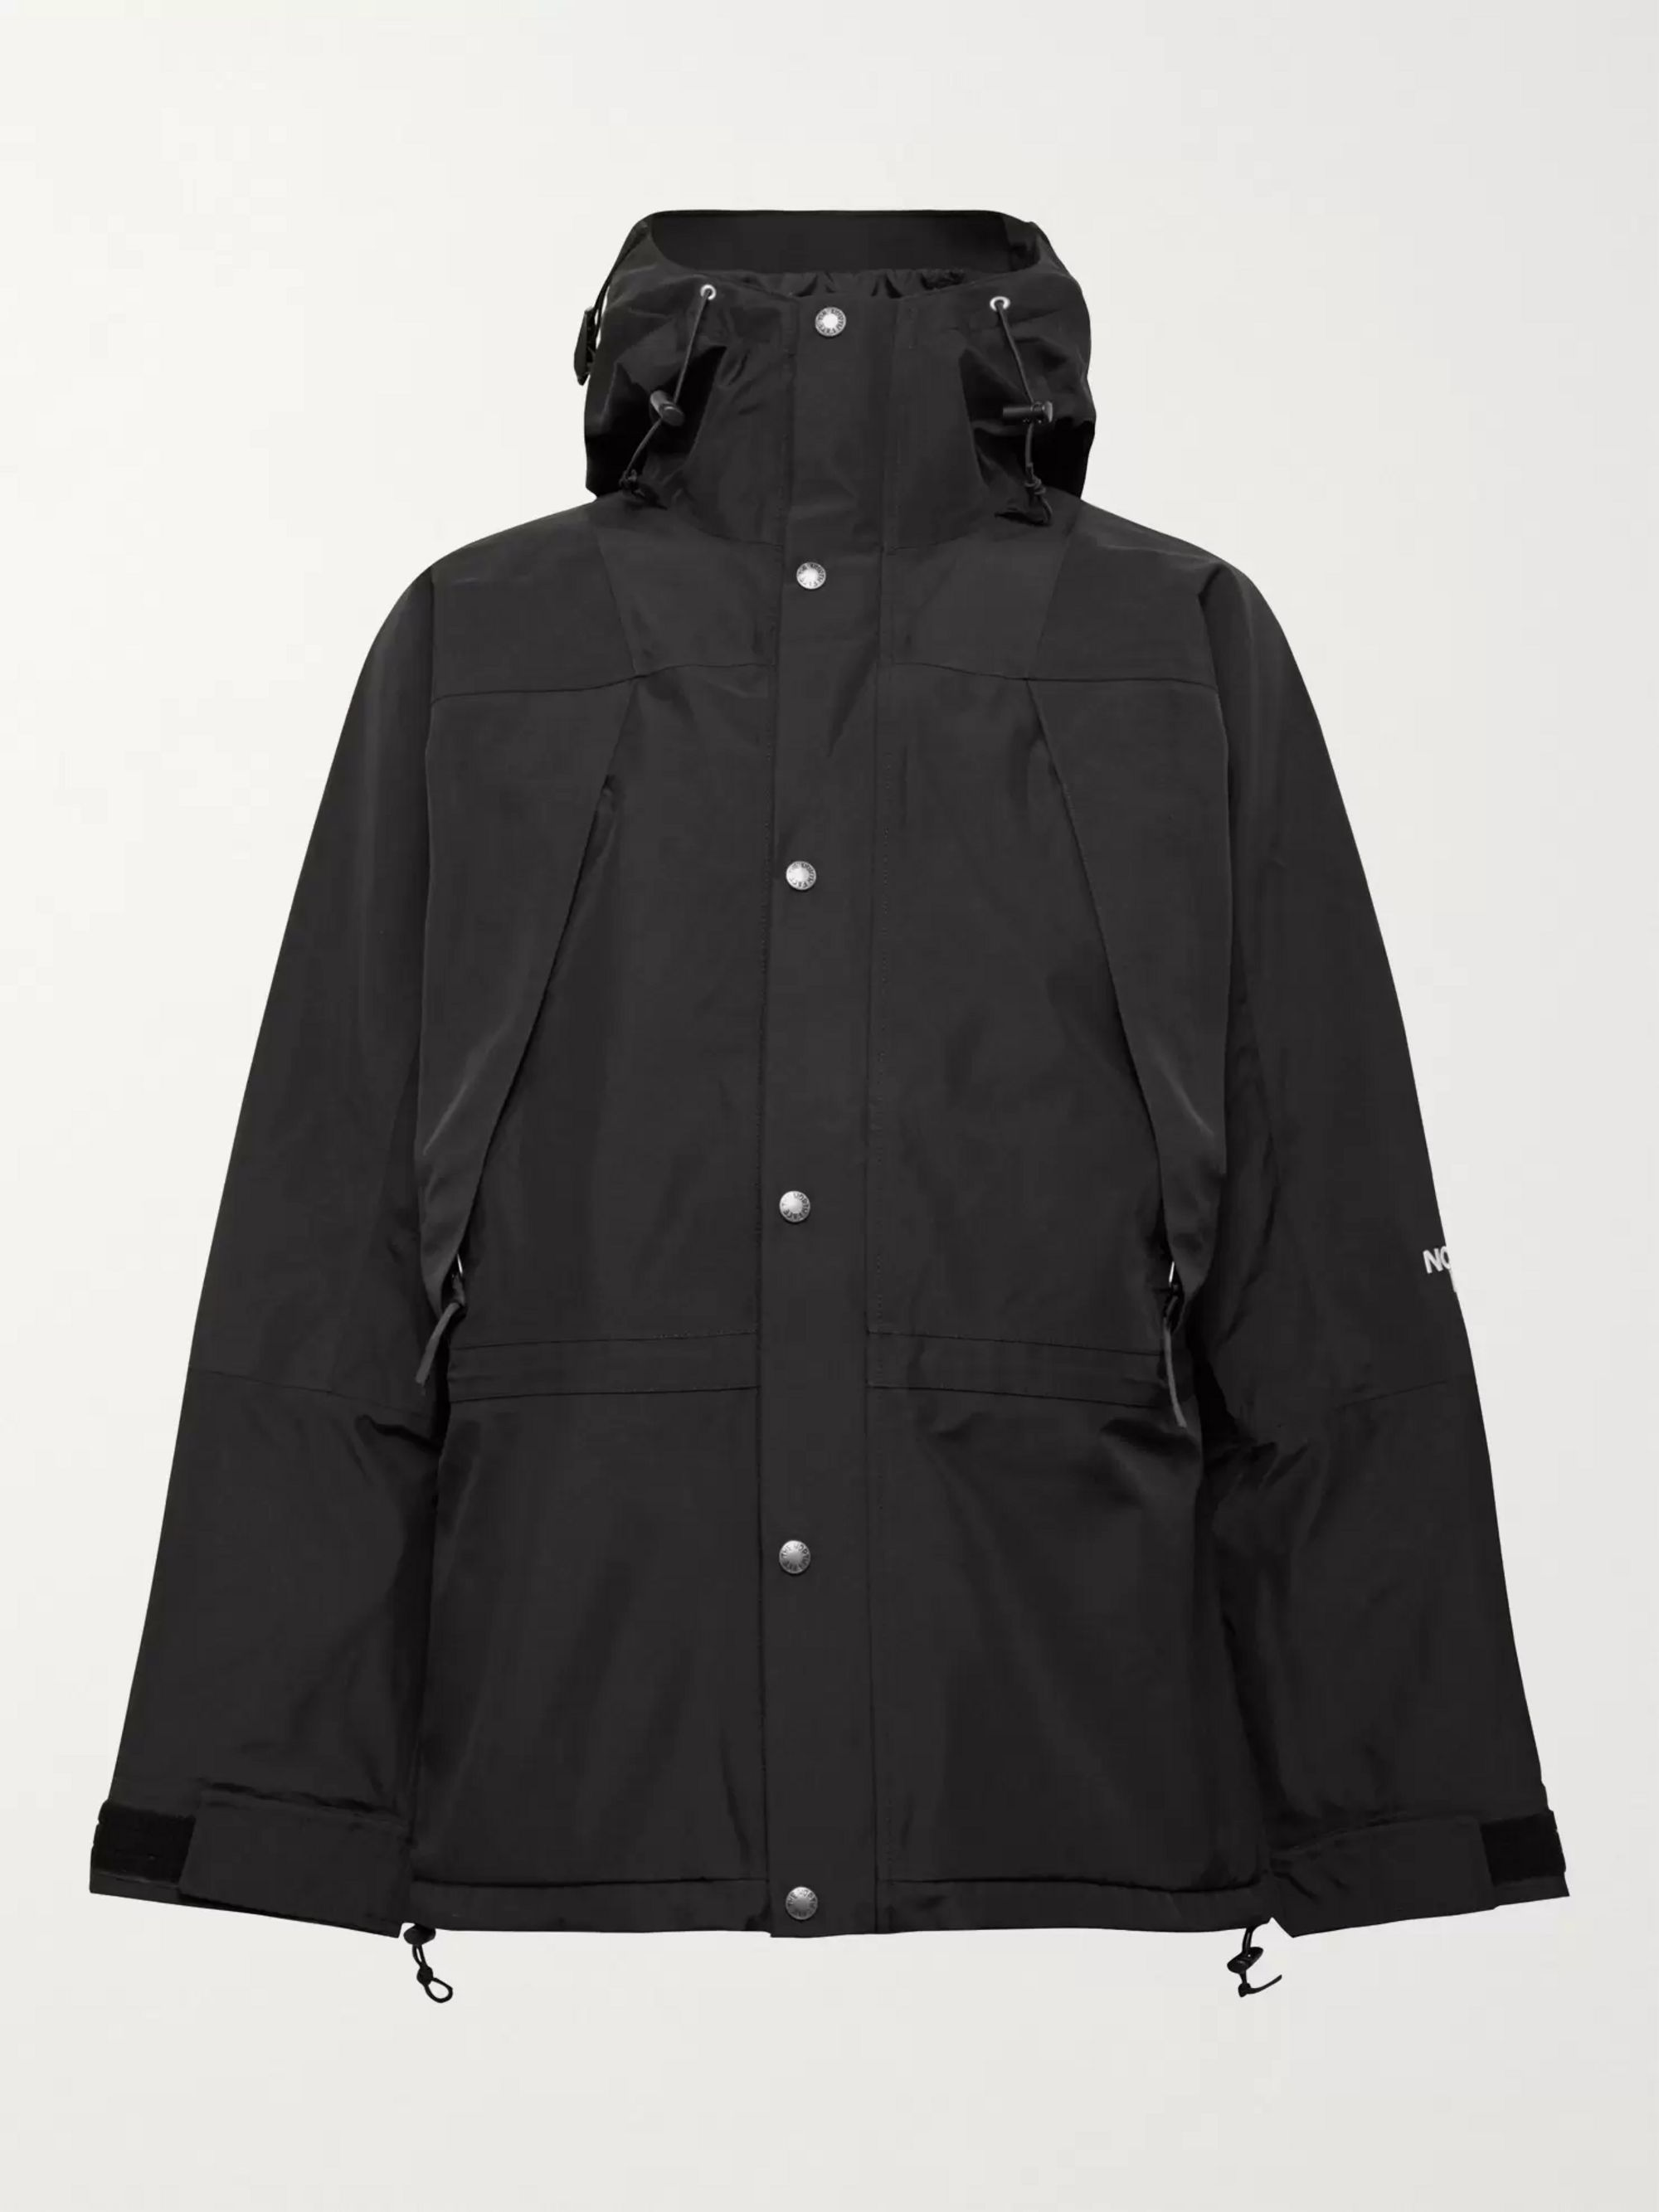 The North Face 1994 Retro Mountain Light FUTURELIGHT Jacket